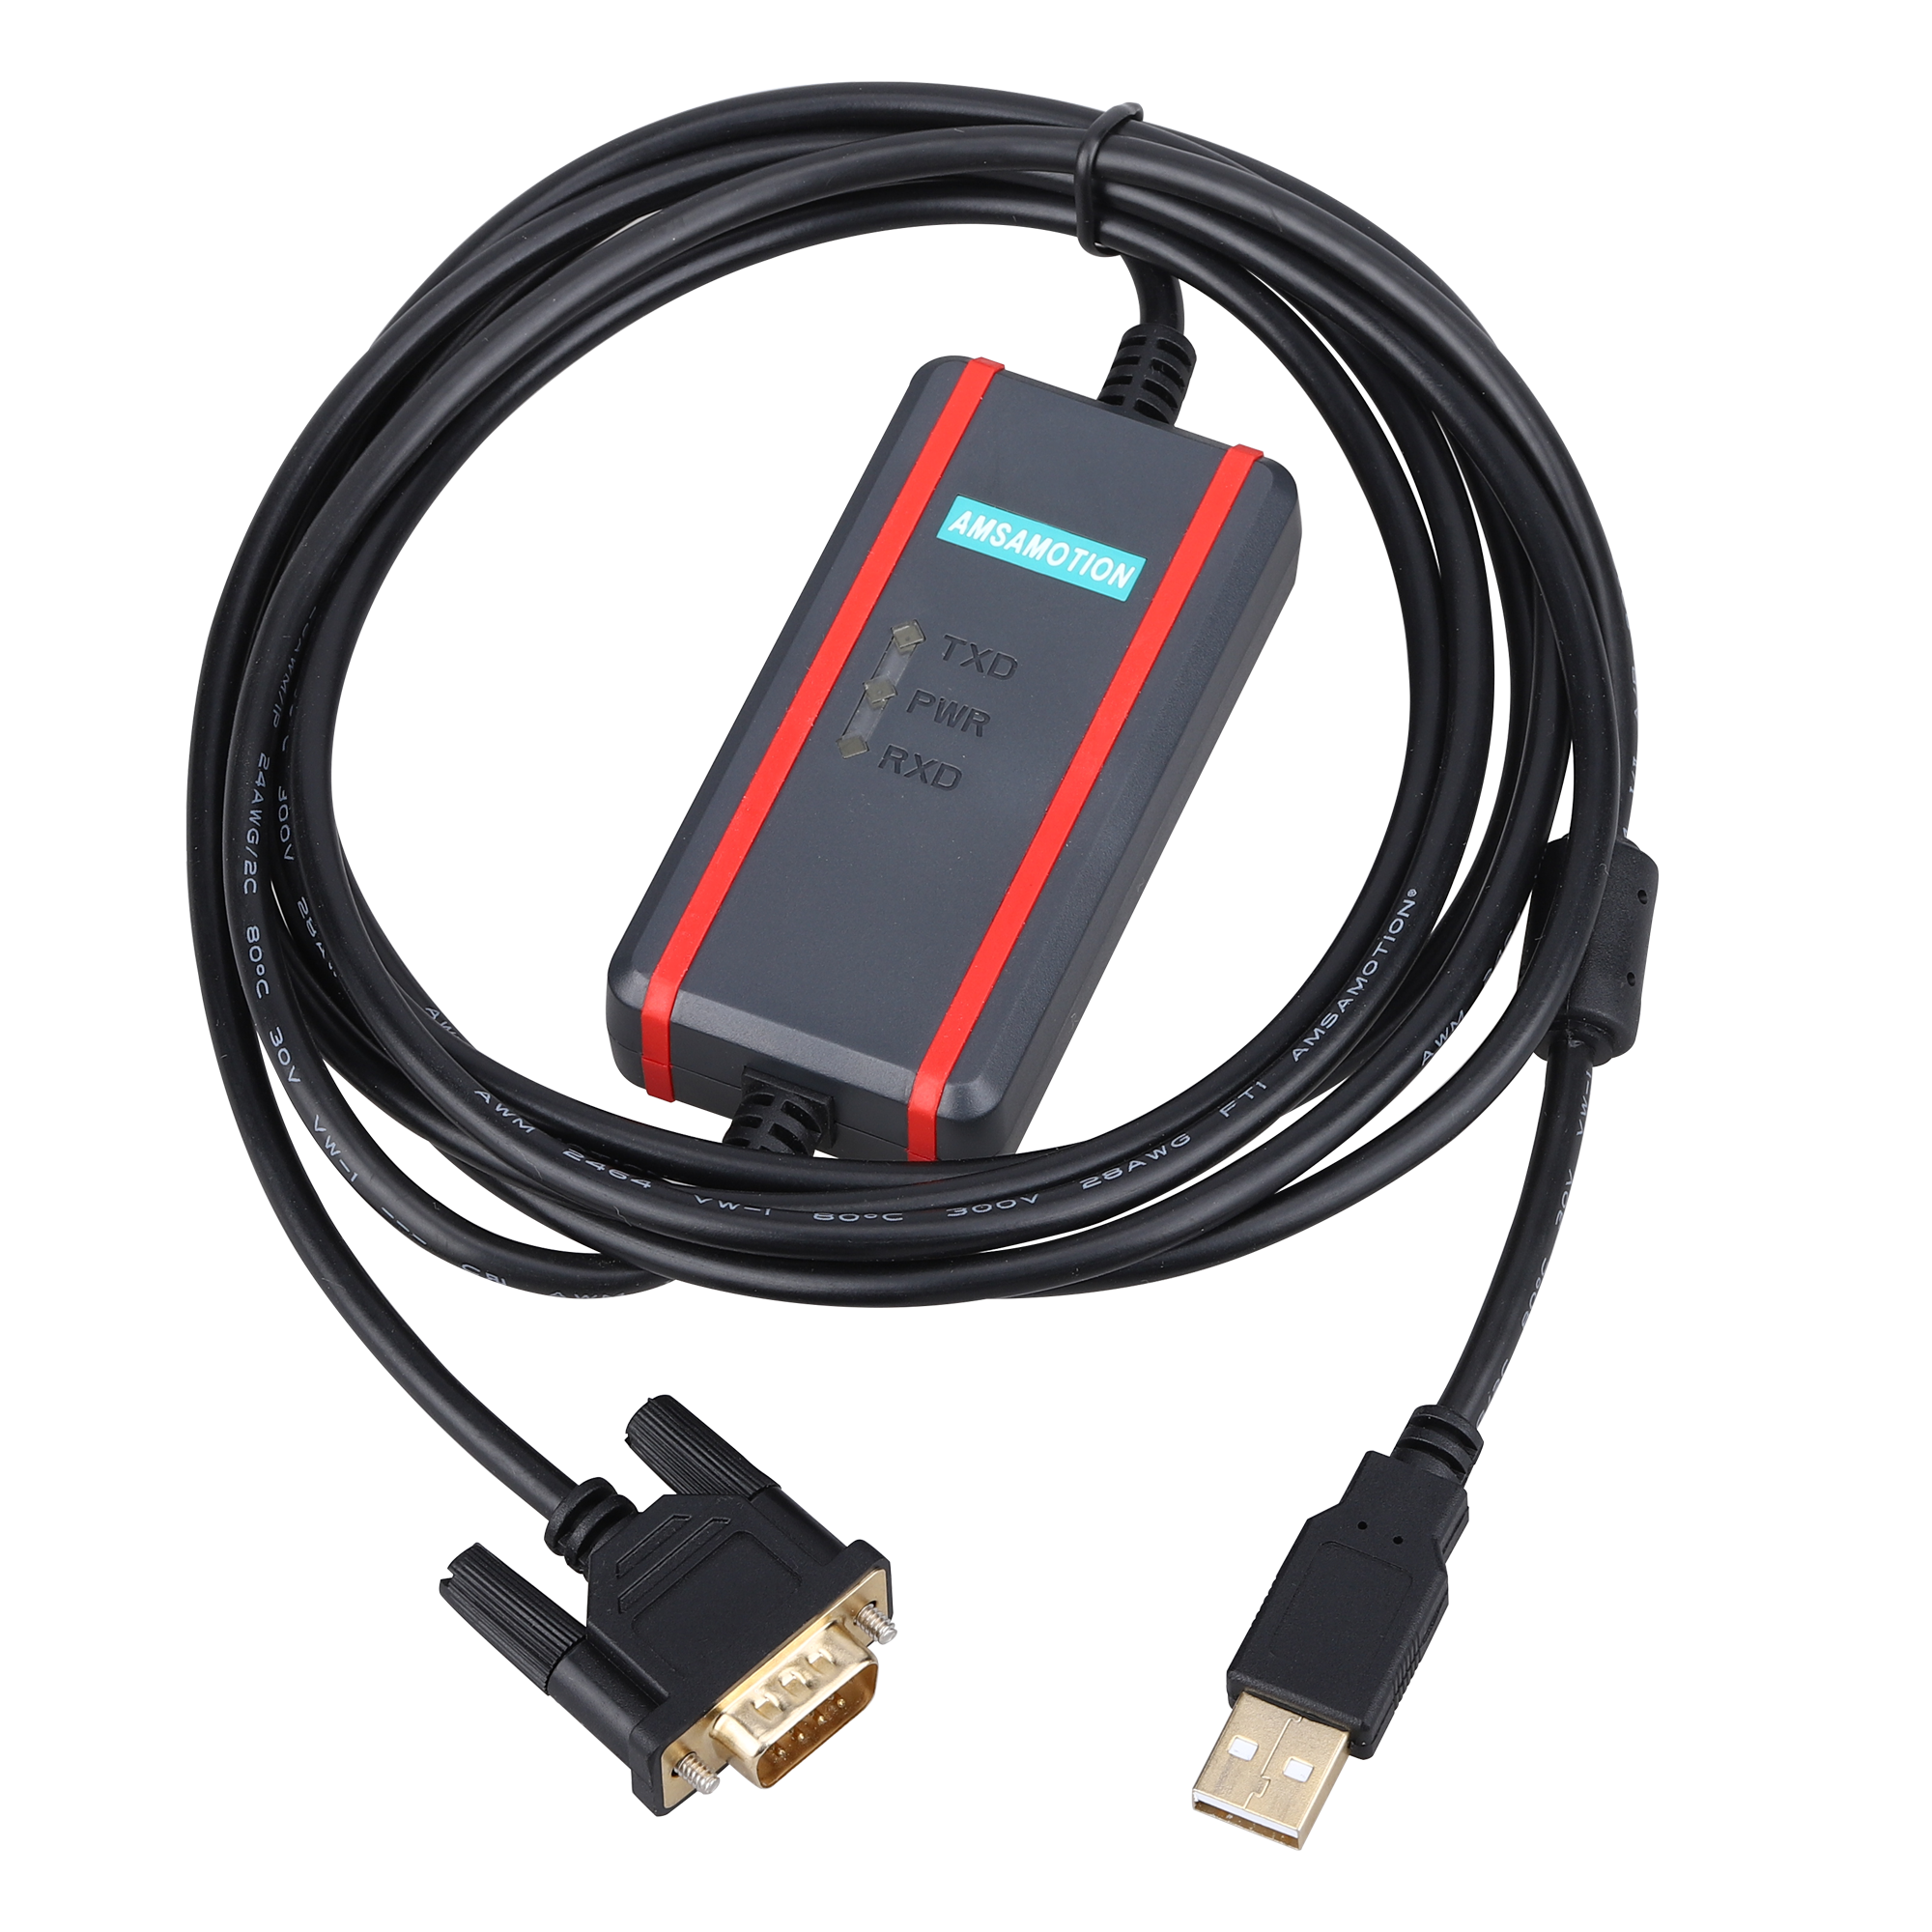 Isolated Programming Cable 6ES7972-0CB20-0XA0 For S7-200//300//400 PLC USB-MPI PPI